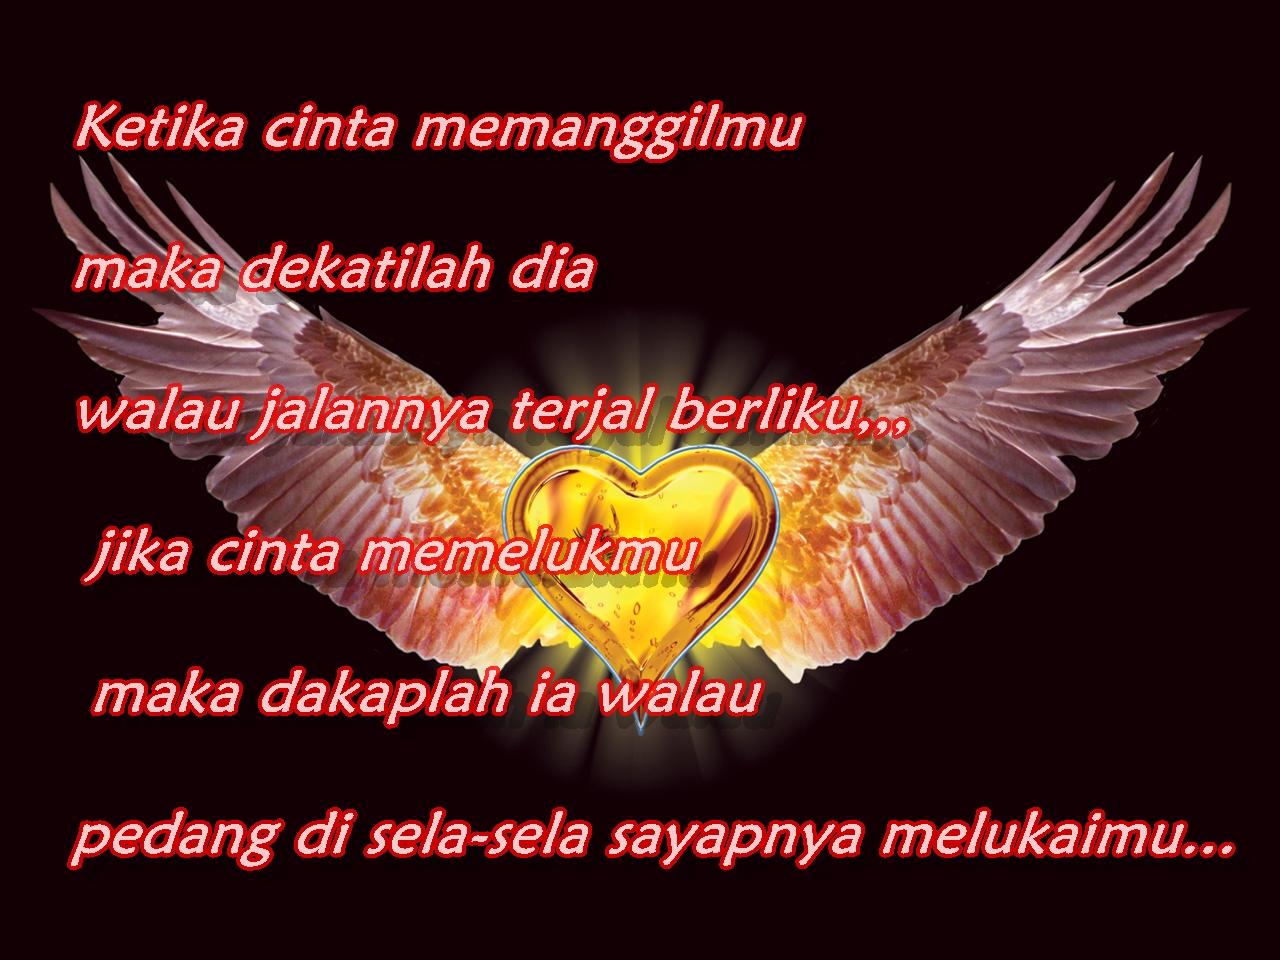 http://4.bp.blogspot.com/-PgkVP8_qroo/T09ktIkSEQI/AAAAAAAADDA/CI6JDFTSUP8/s1600/Cinta+Memanggil.jpg